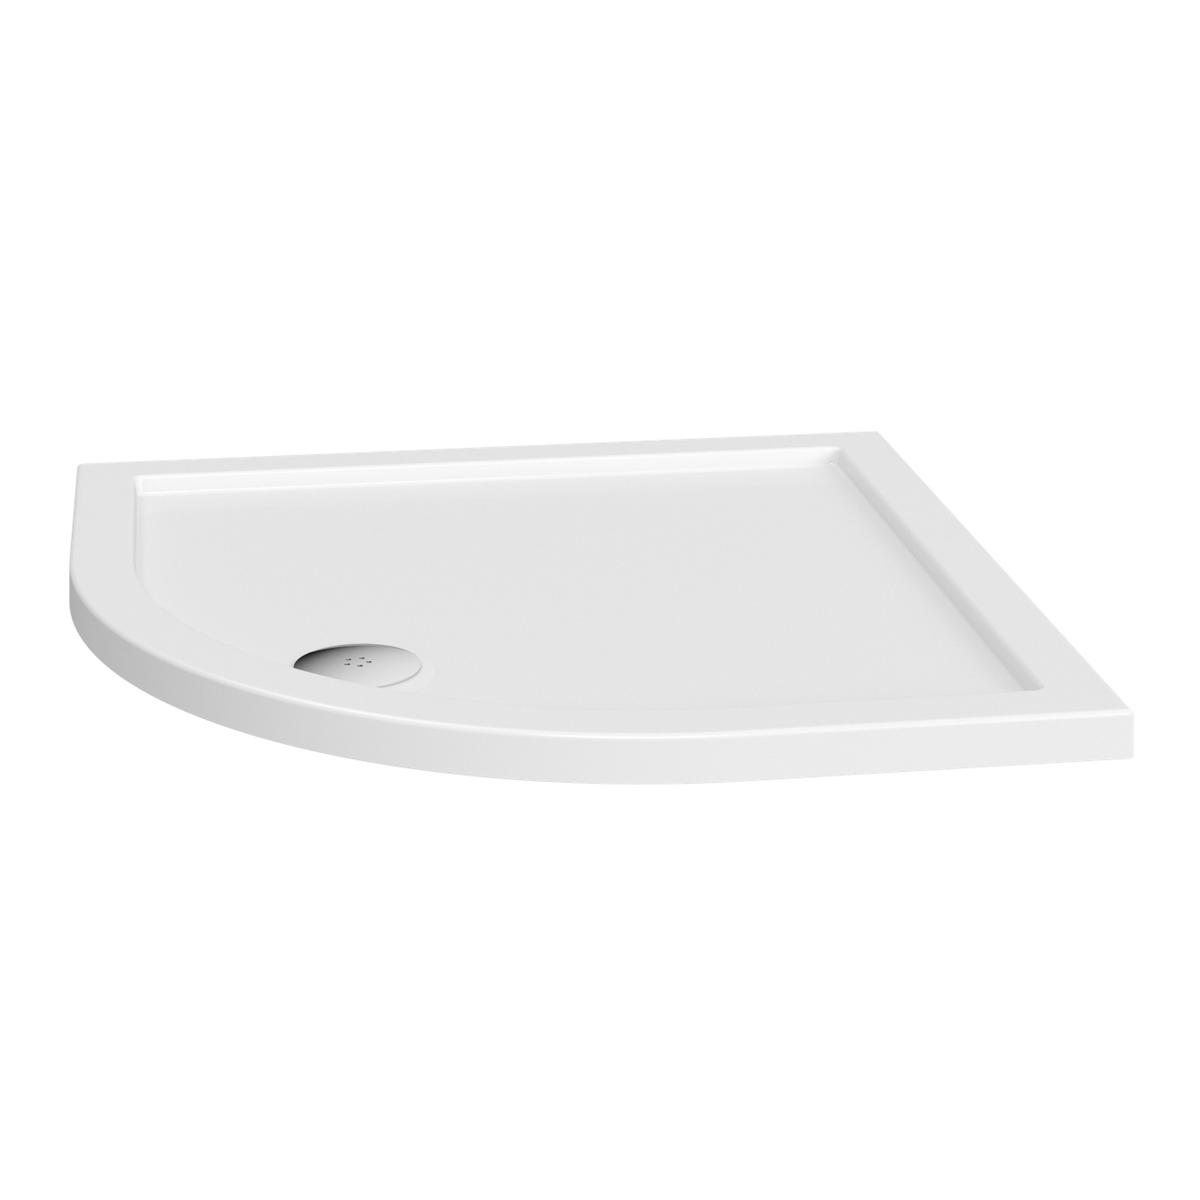 Image of Quadrant Pearlstone Shower Tray 800x800